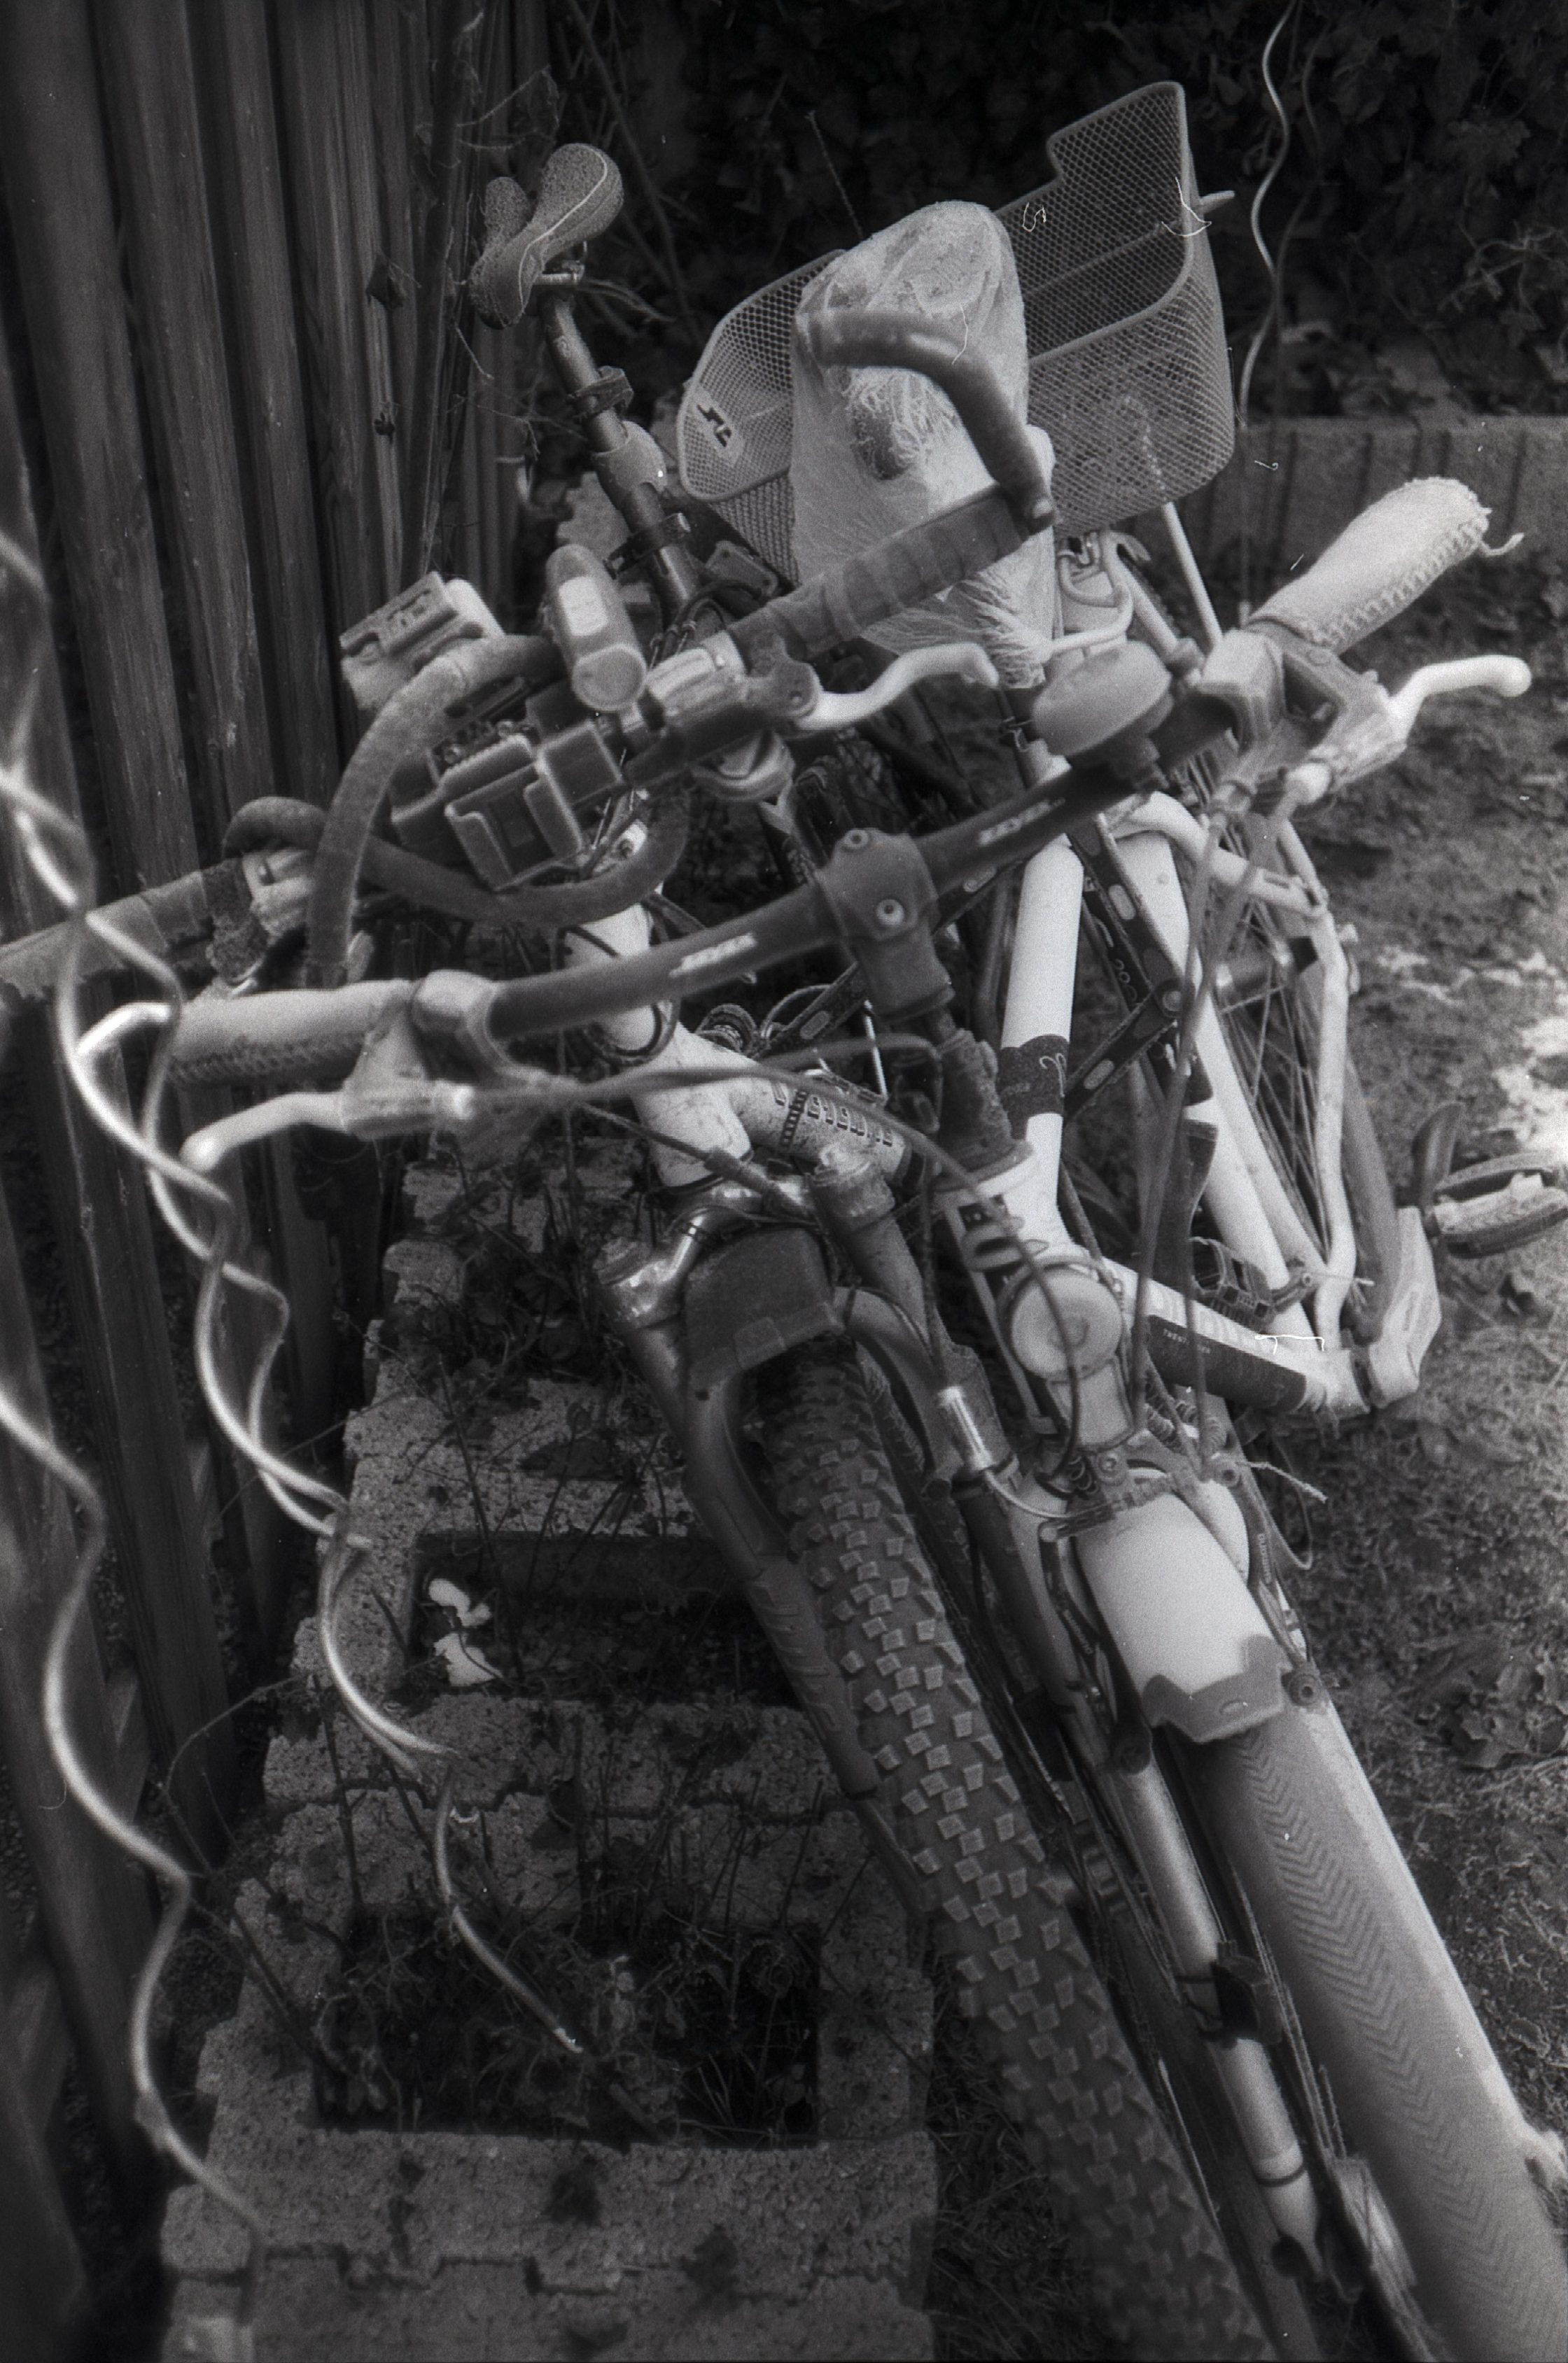 #015 Film per day – Our frozen bikes, Graz